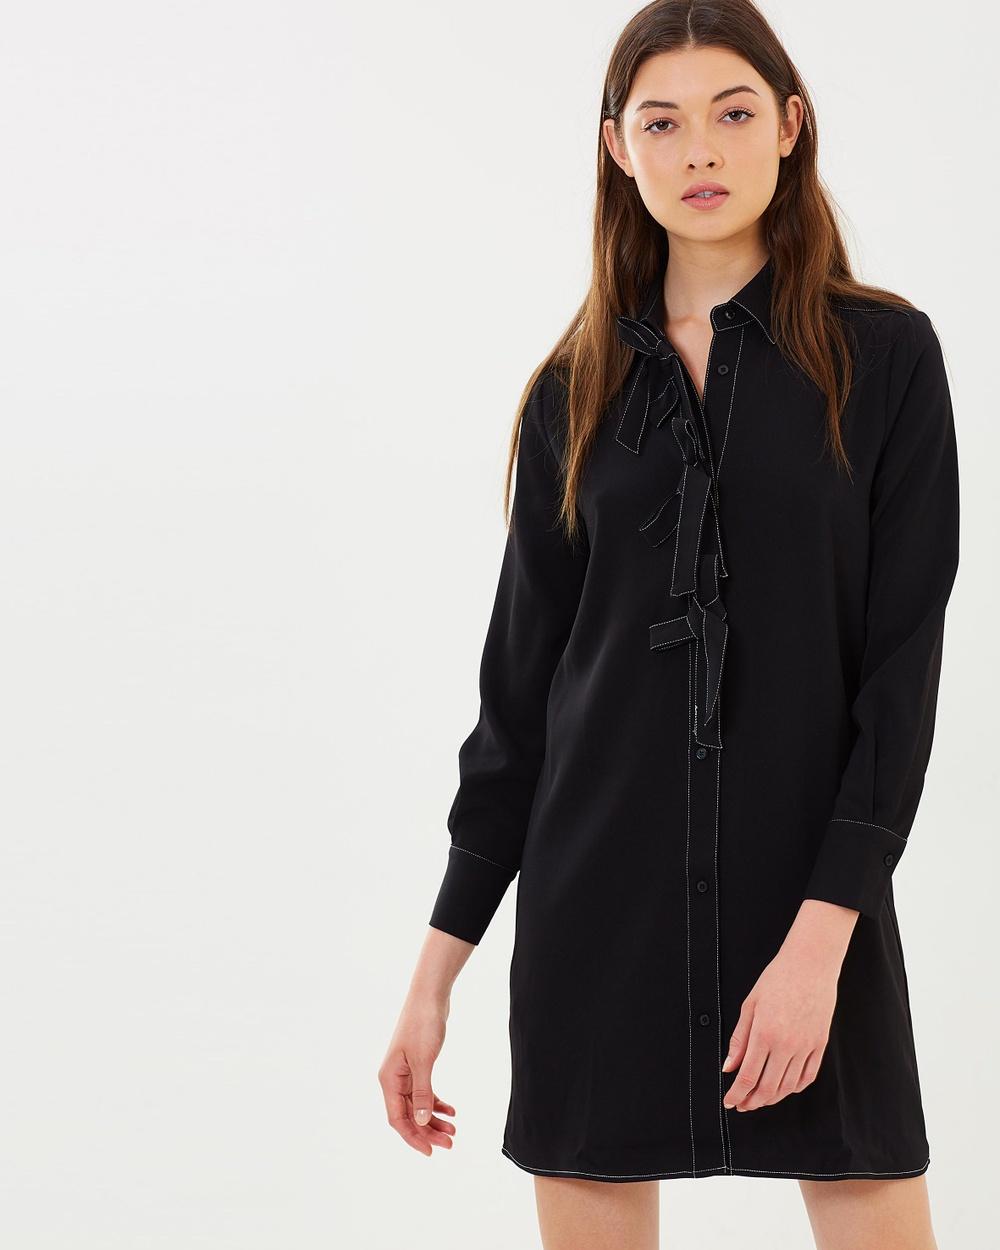 M.N.G Lazos Dress Dresses Black Lazos Dress